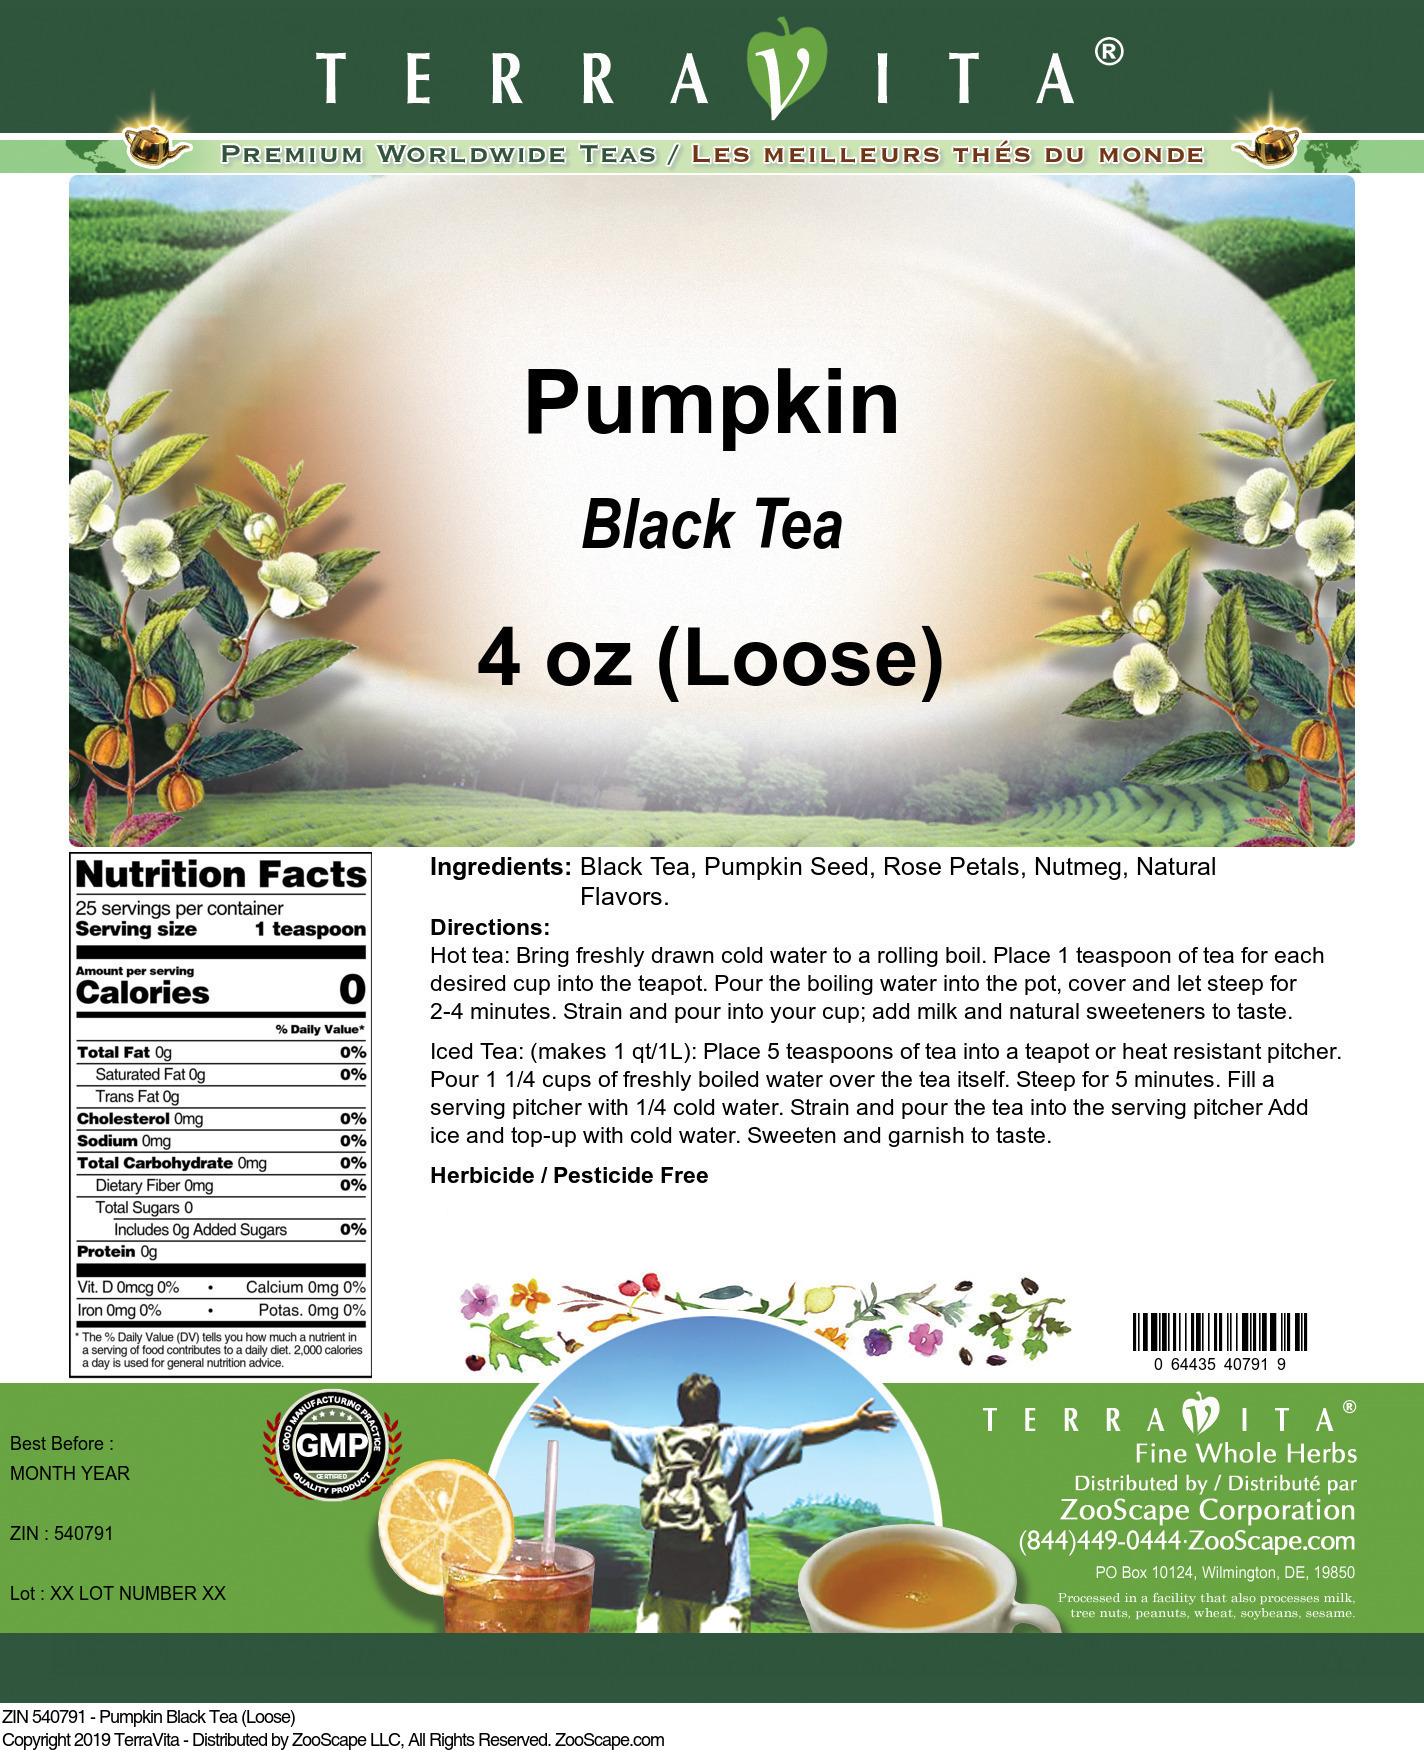 Pumpkin Black Tea (Loose)